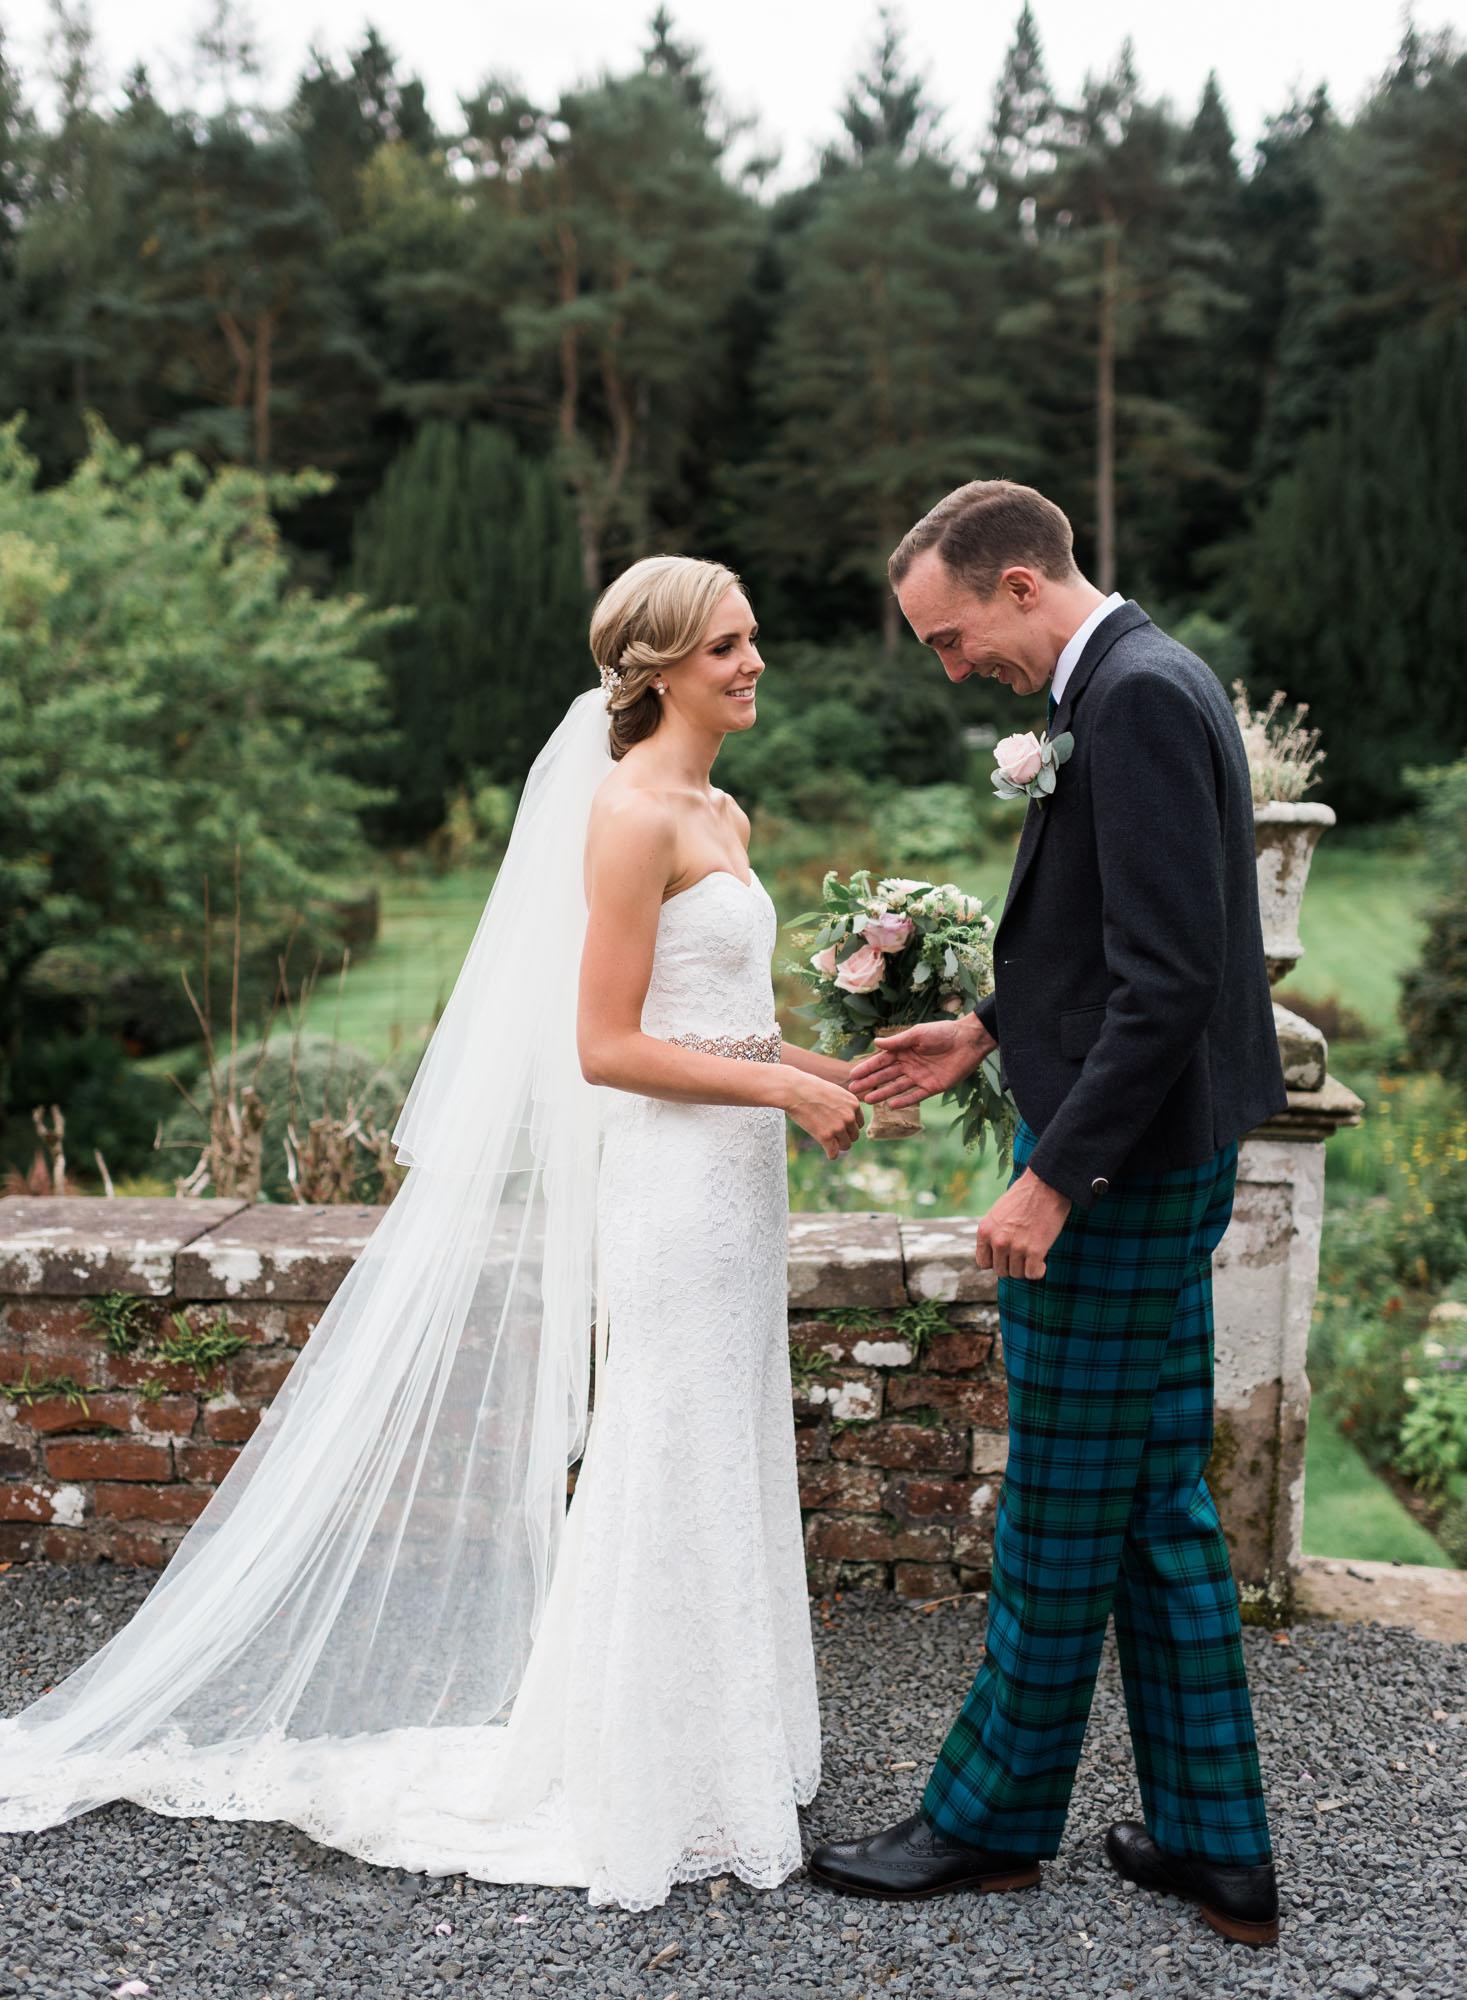 scottish_wedding_blairquhan_castle-44.jpg